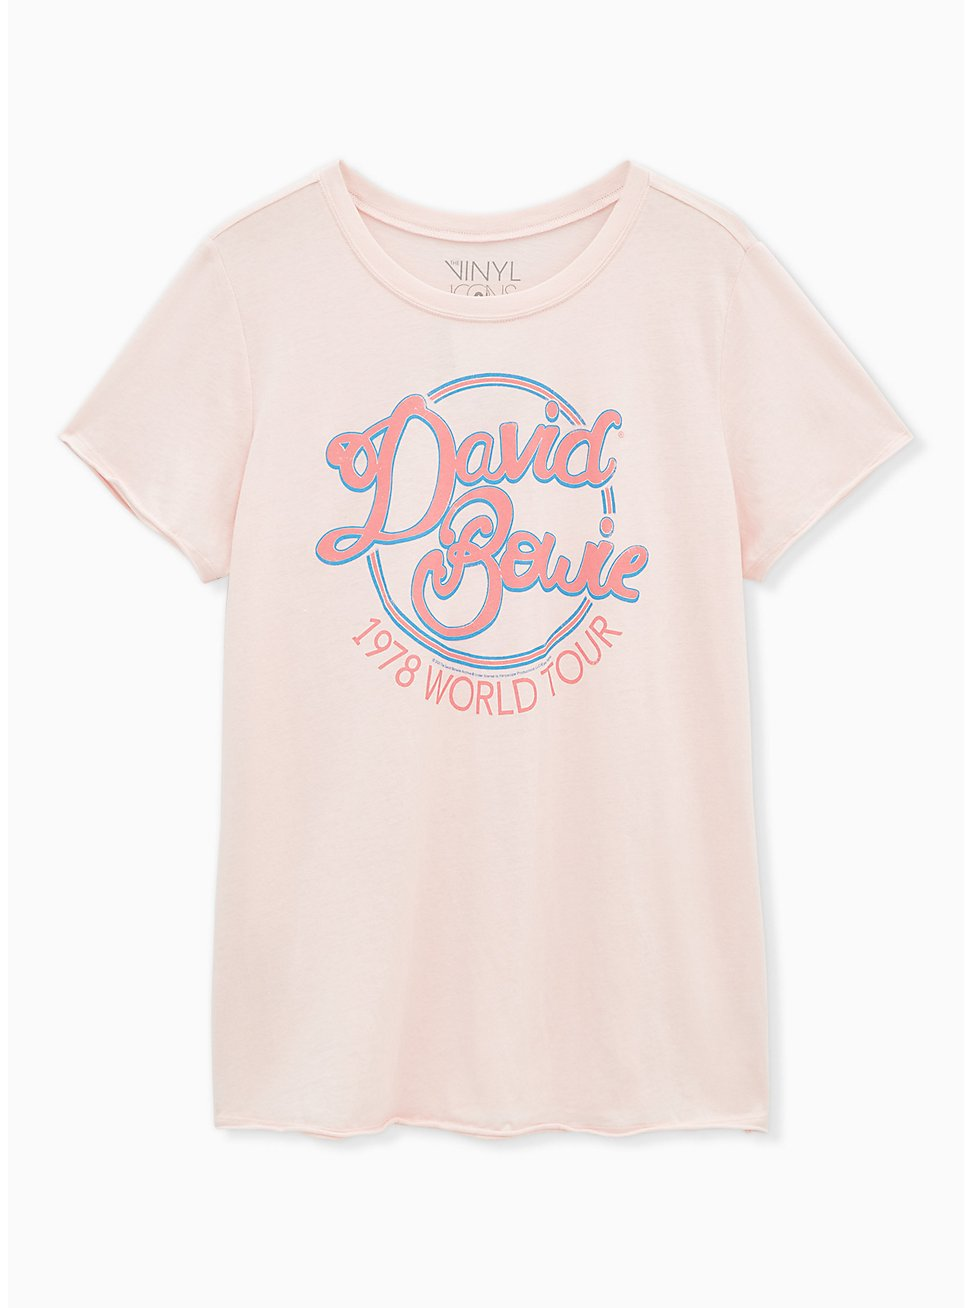 Plus Size David Bowie 1978 World Tour Crew Neck Tee - Light Pink, , hi-res